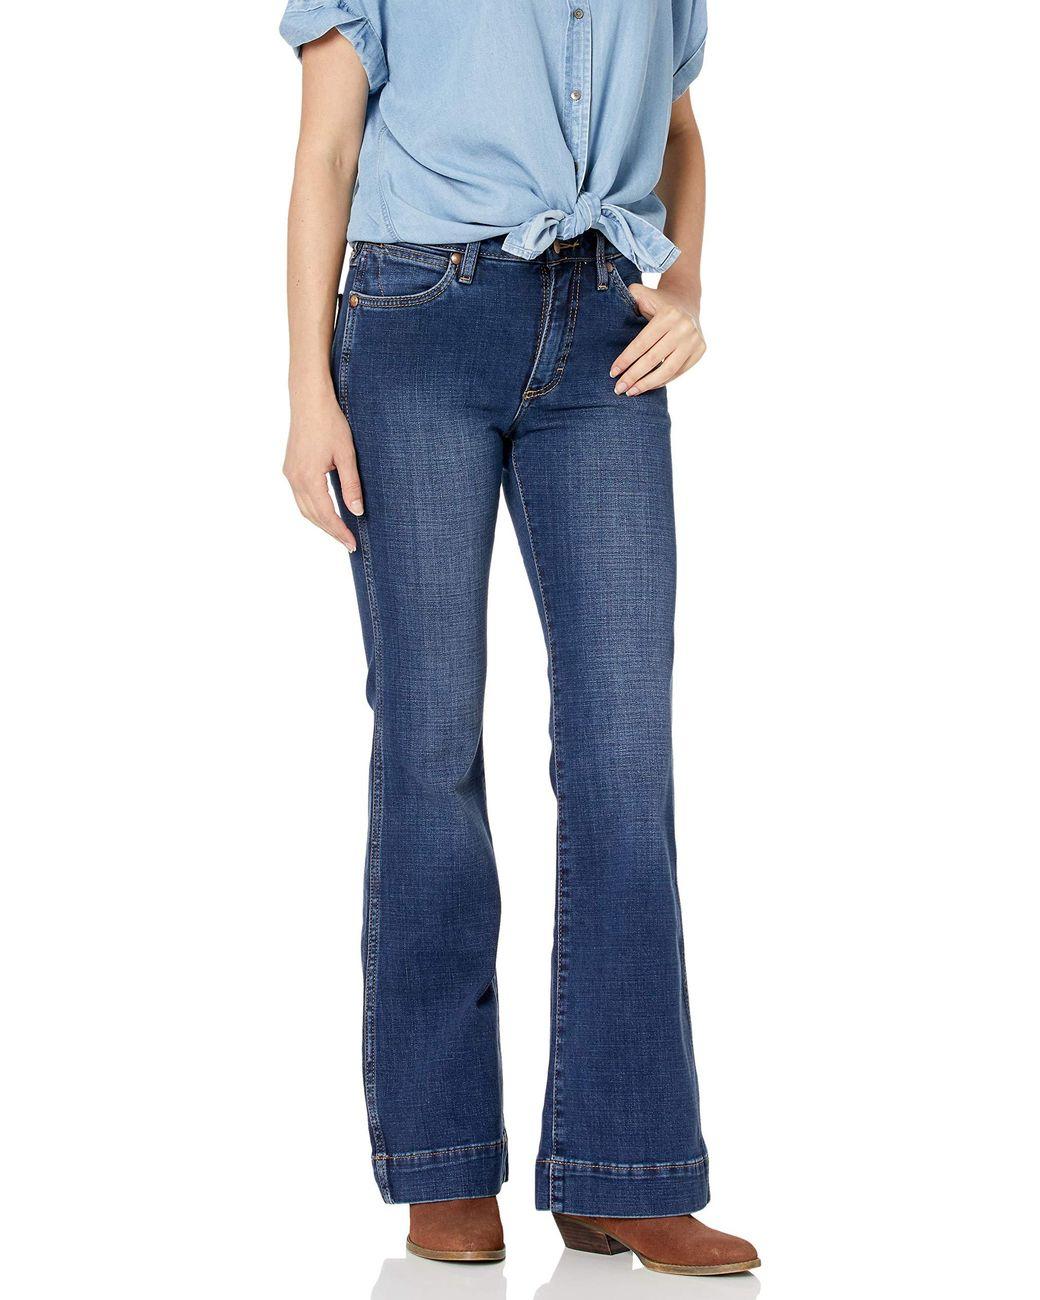 Wrangler Womens Retro Premium High Waist Trouser Jeans